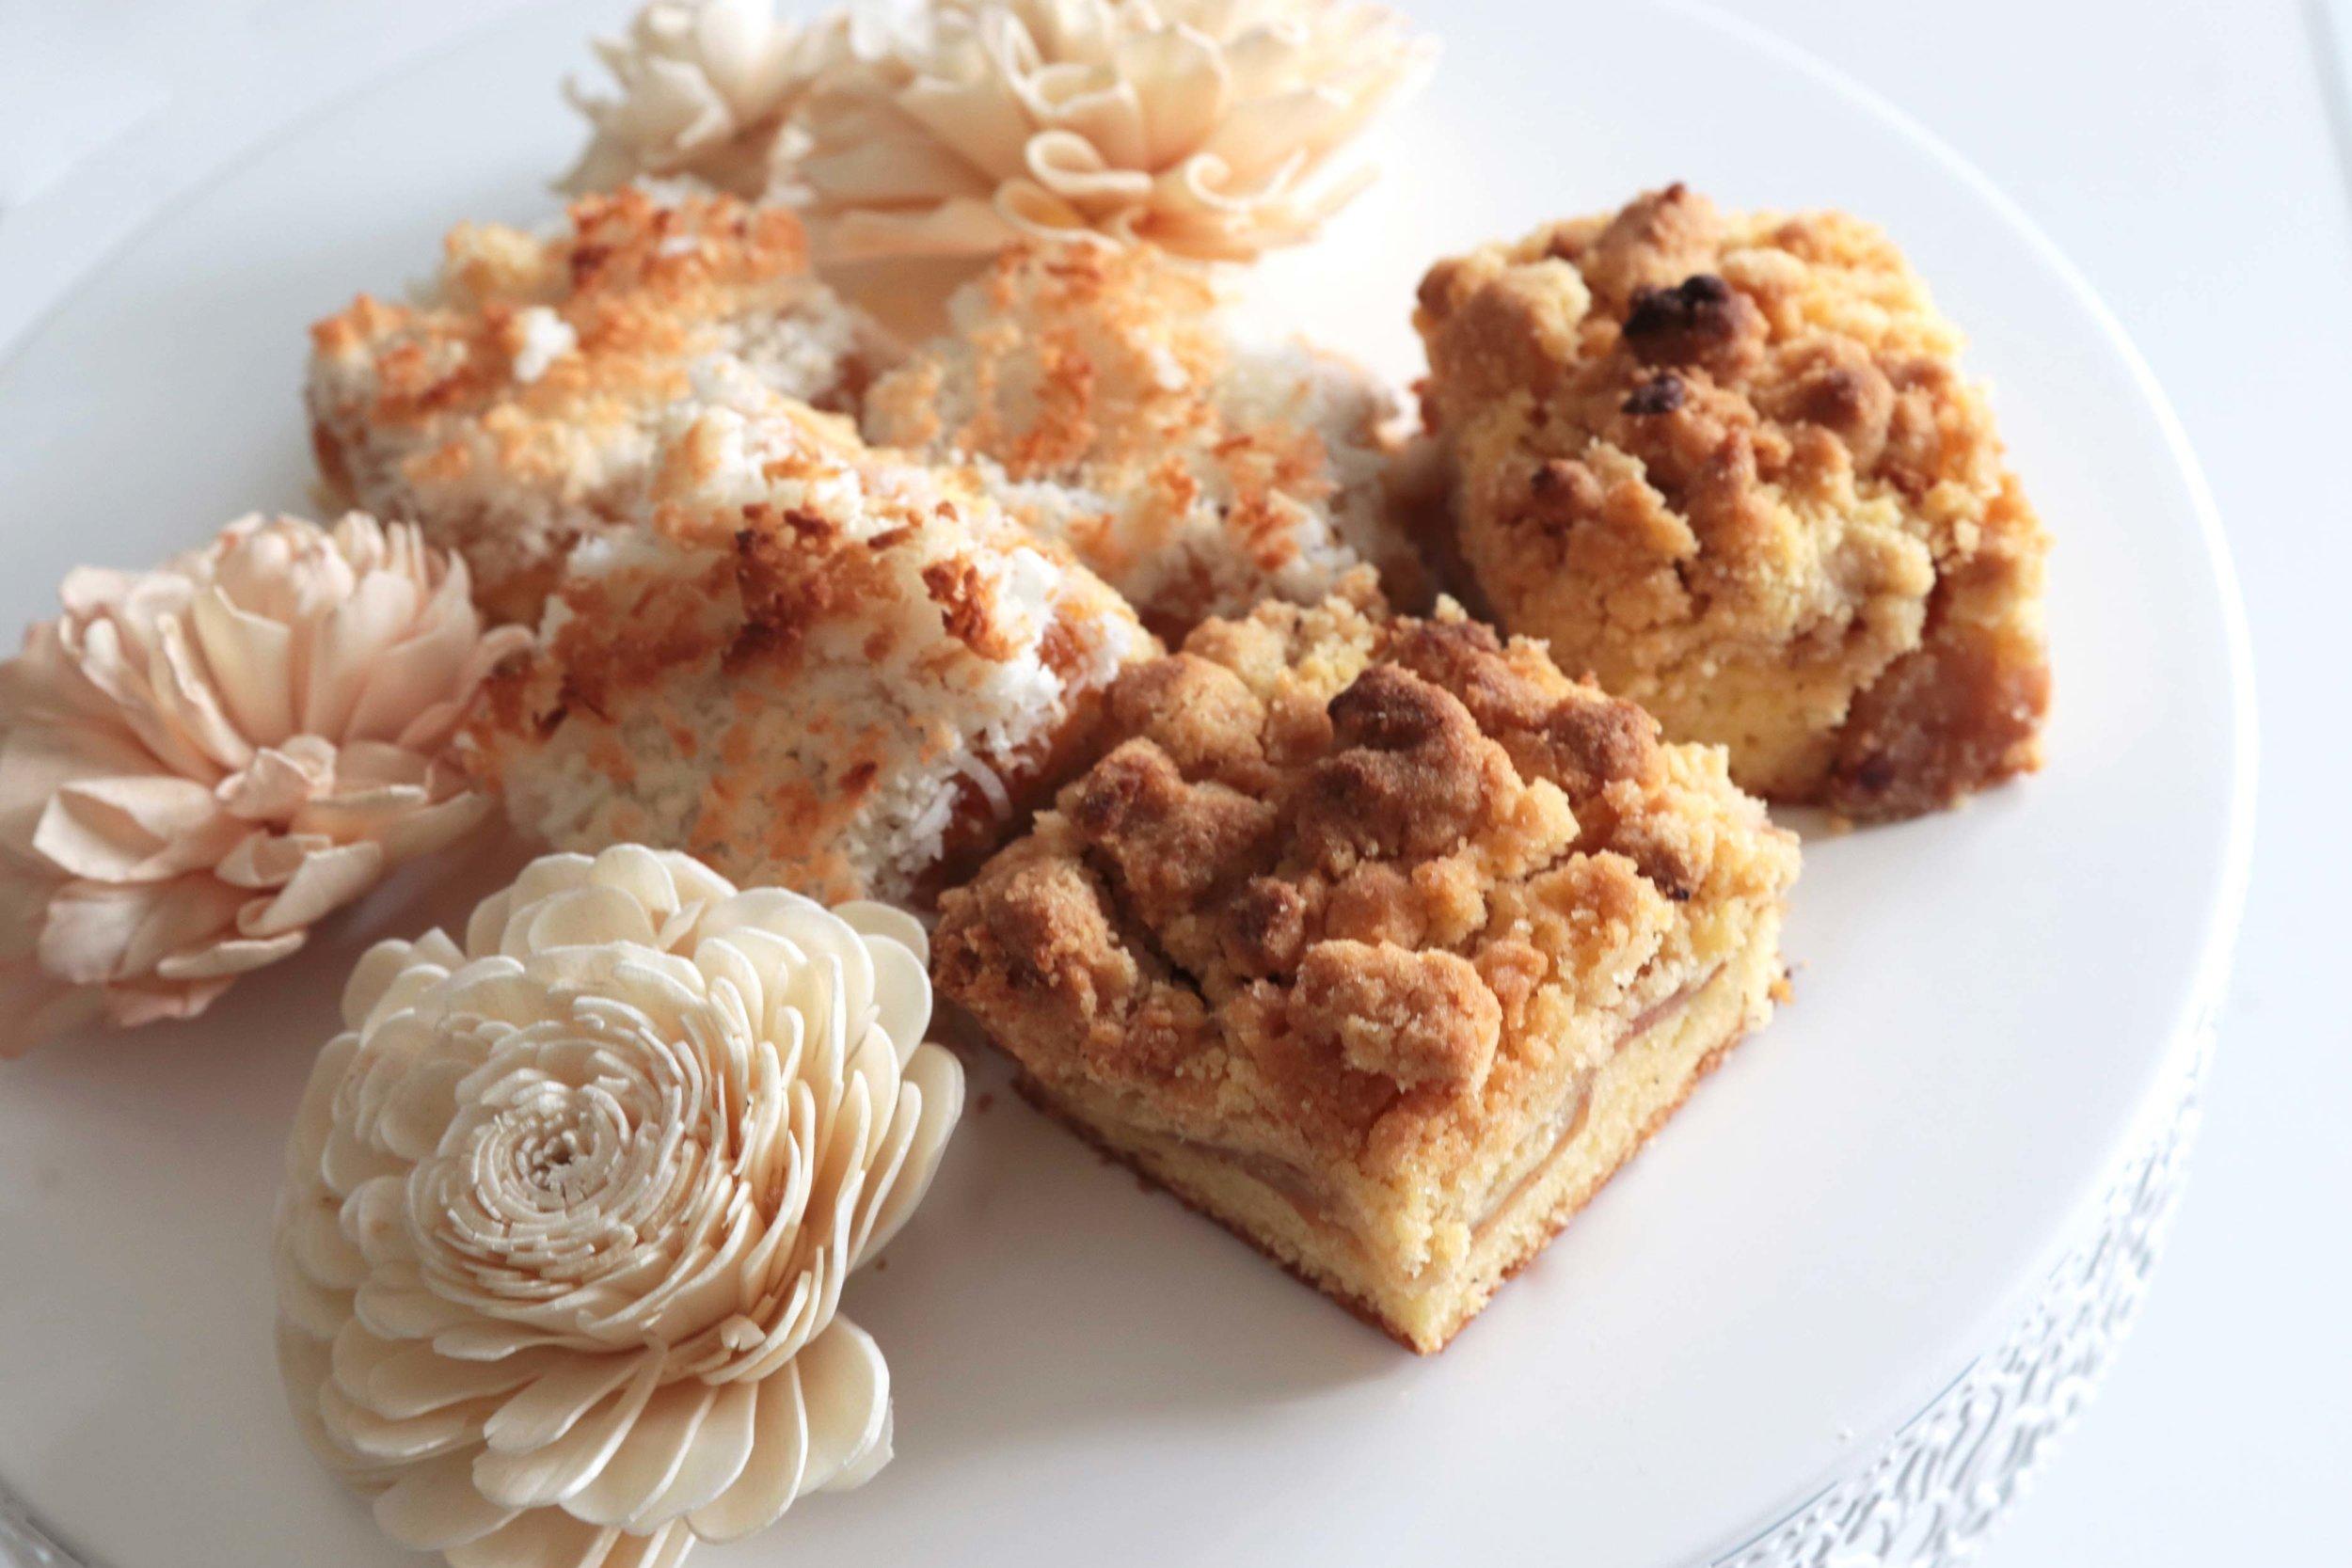 The_Little_Cake_Maker_Perth_Baker_CustomCakes_DayCakes_Slices_Tarts_Cupcakes_Slices_1.jpg